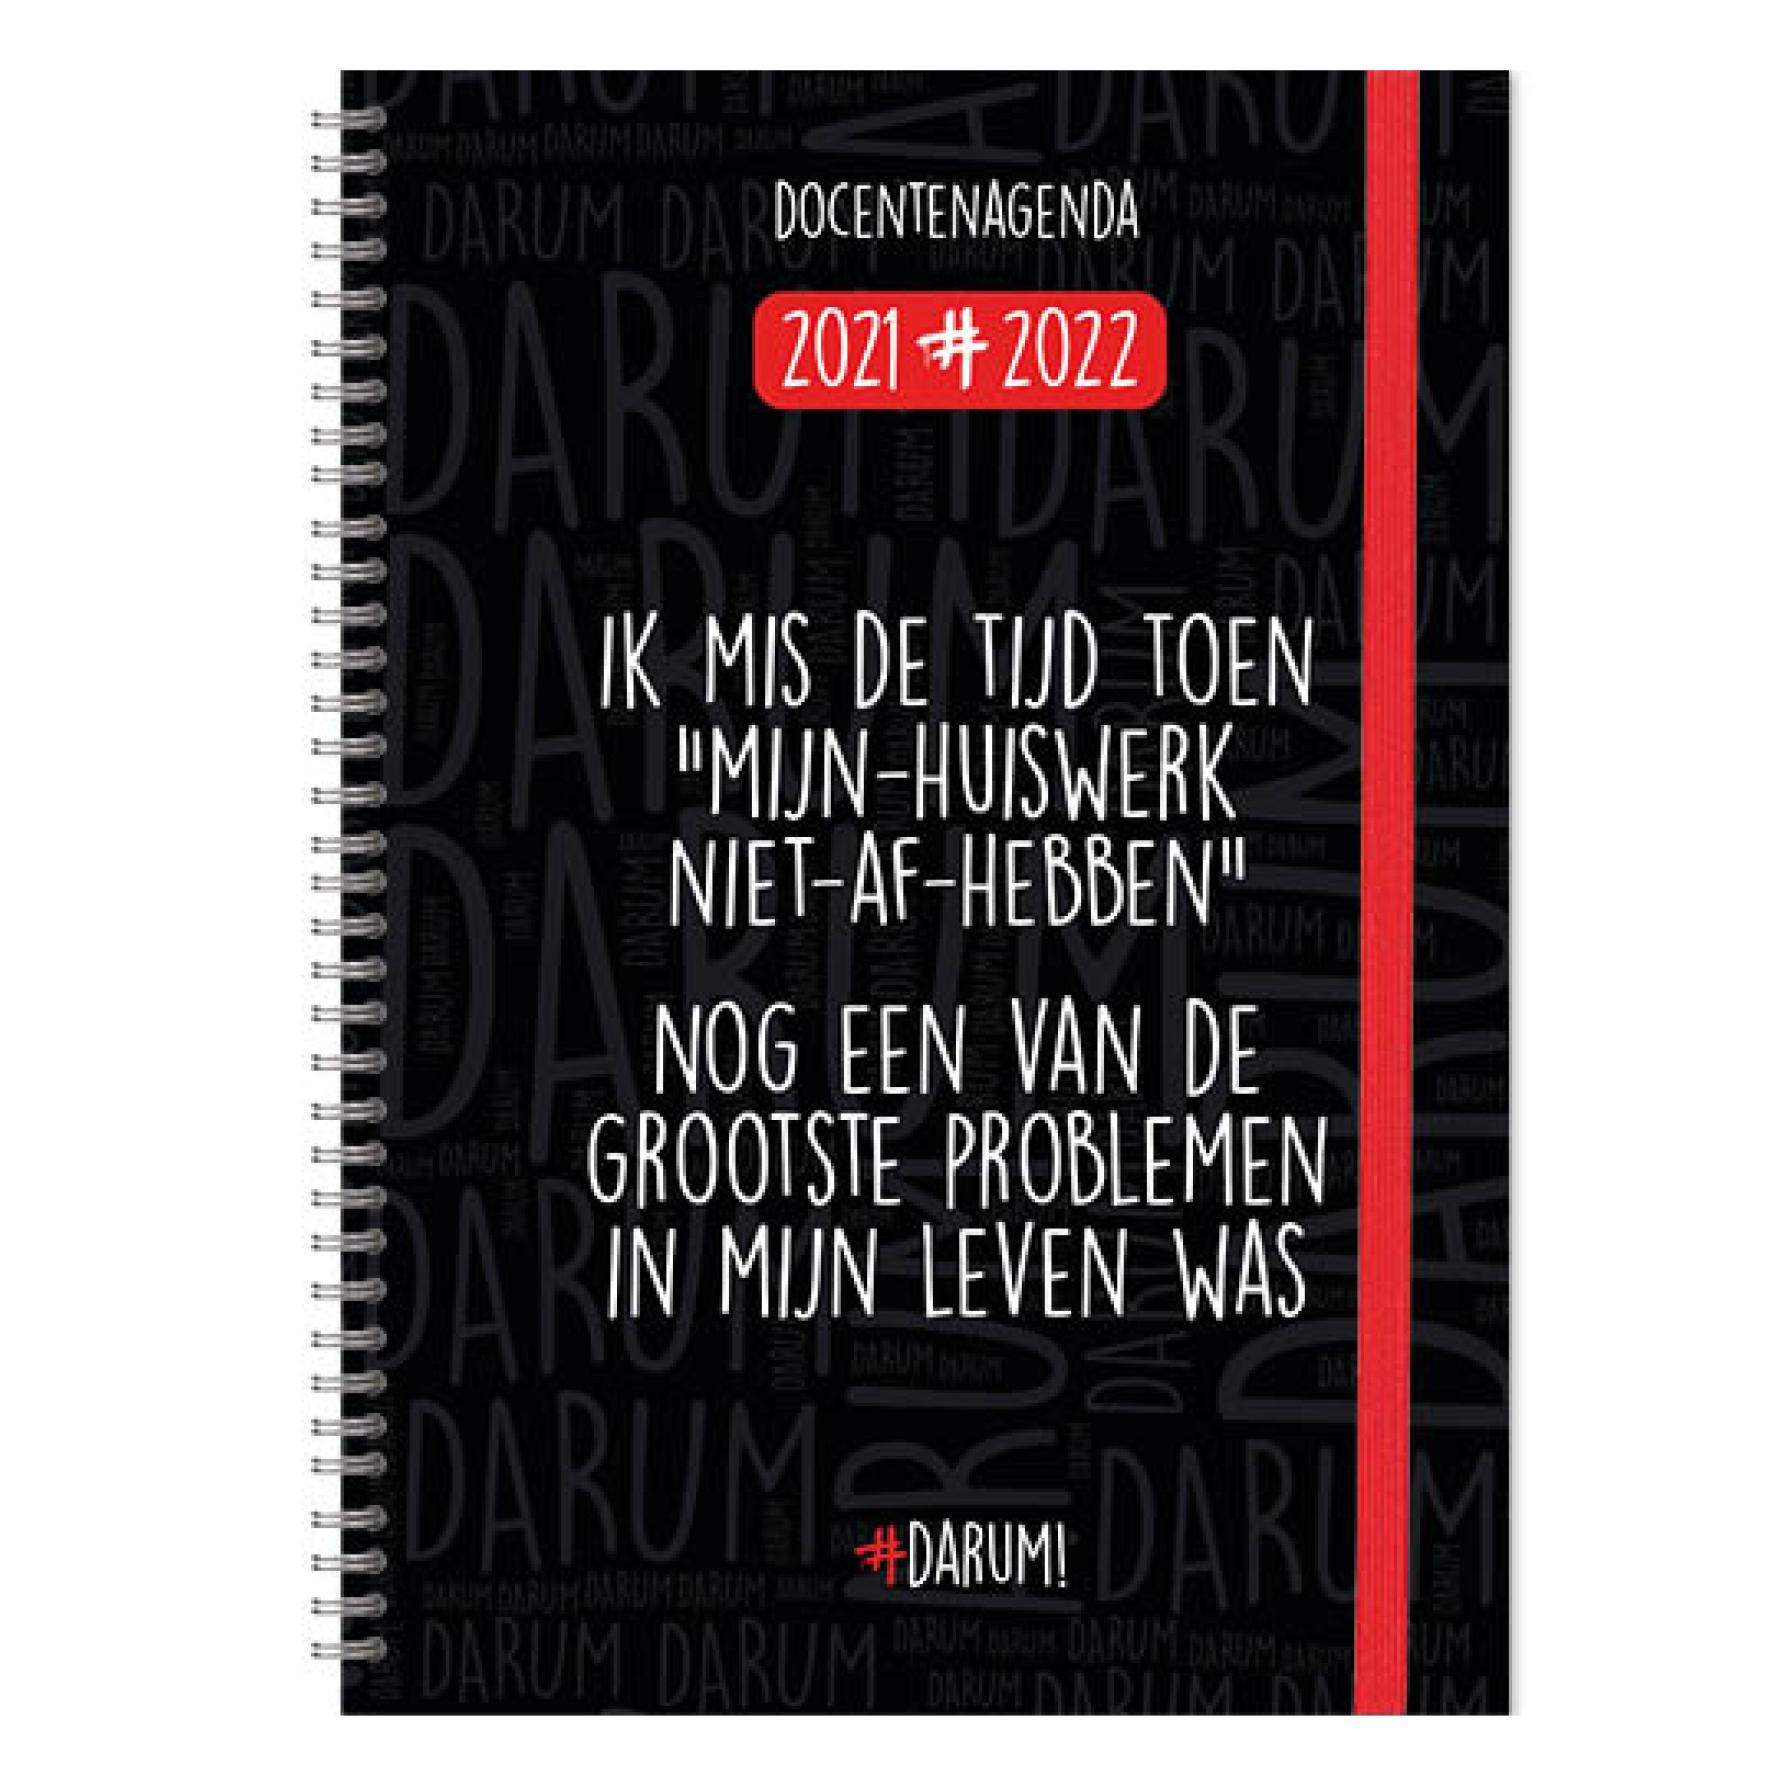 Agenda - 2022 - Docentenagenda - Darum! - A4 - 21x29,7cm